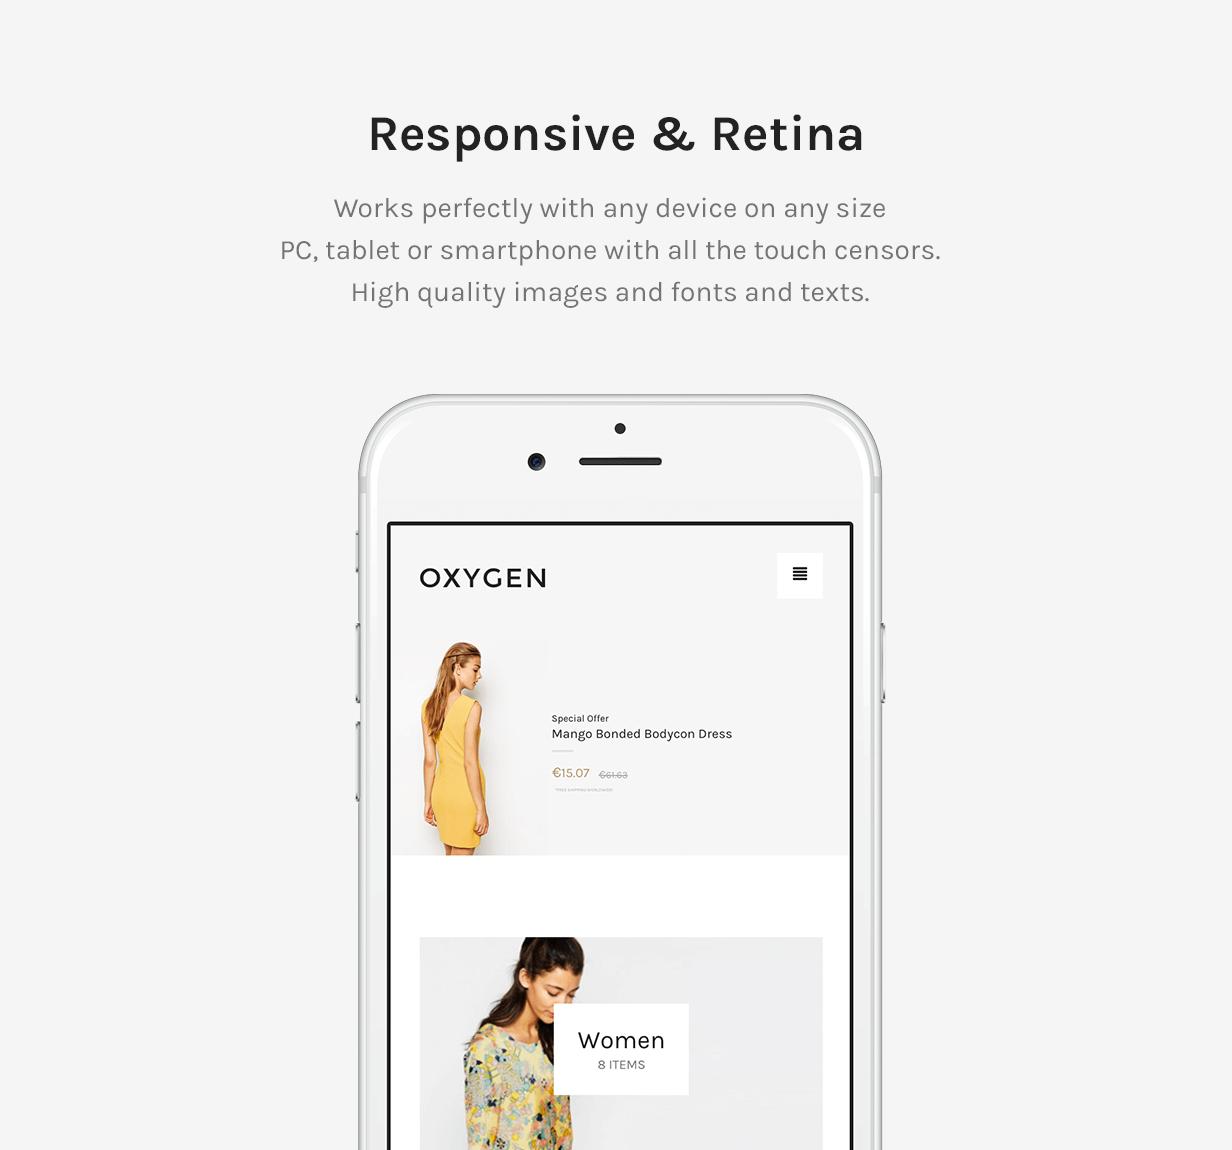 Responsive und Retina